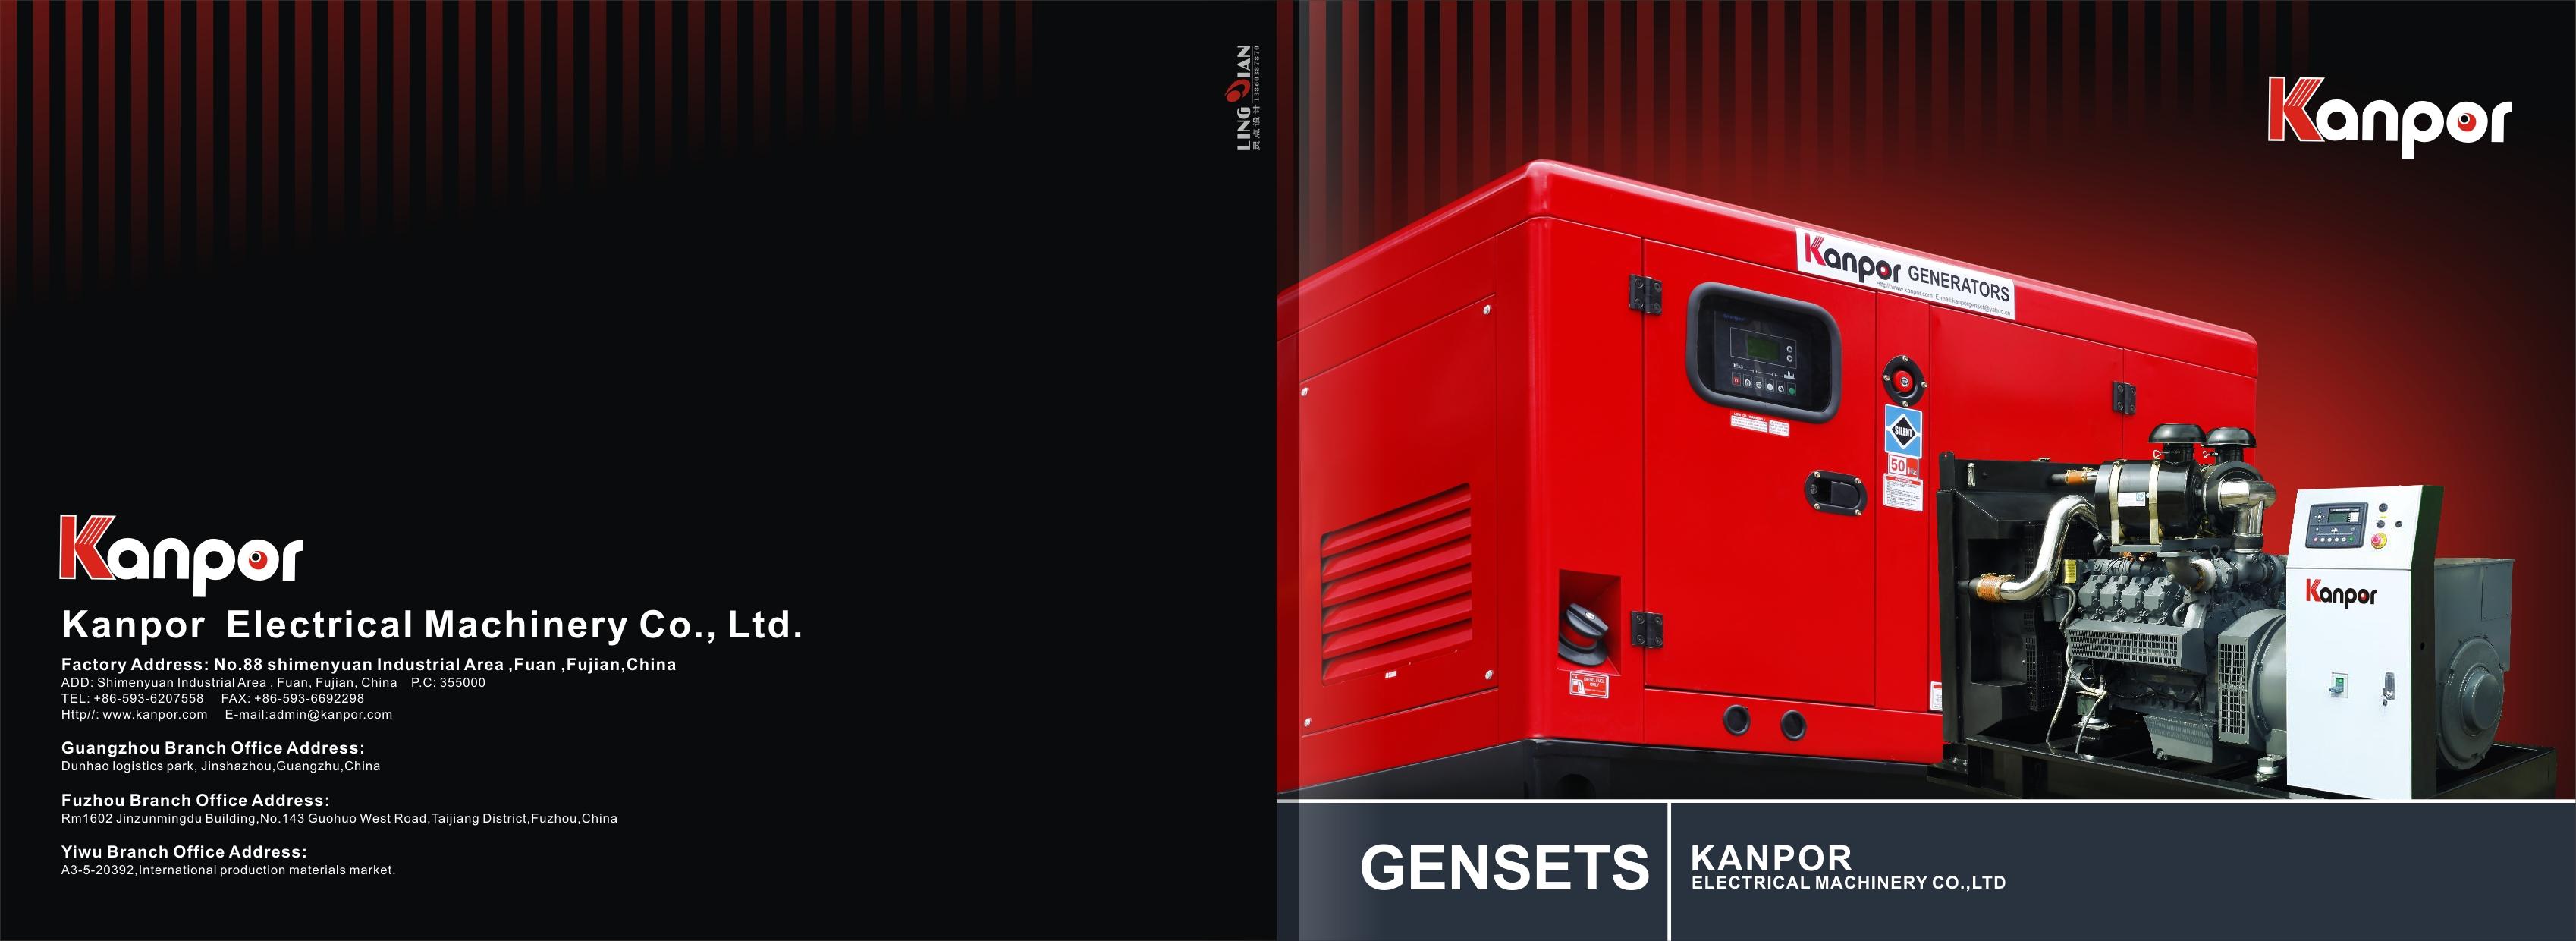 Kanpor generator Catalogue-Kevin Lu